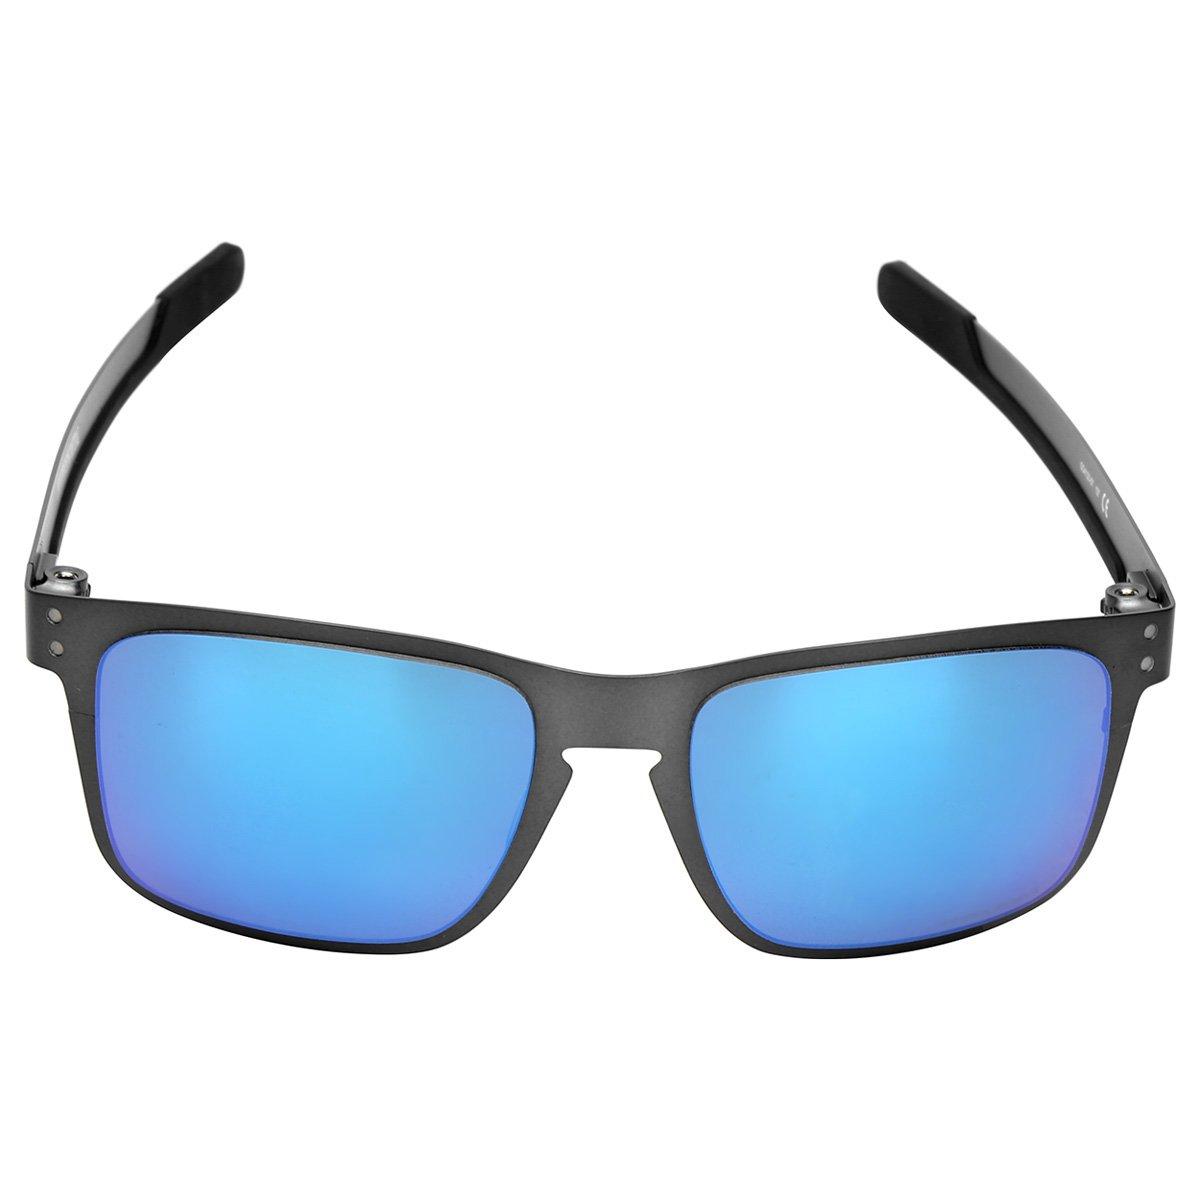 889b1265449ad Óculos Oakley Holbrook Metal-412307 - Chumbo - Compre Agora   Netshoes